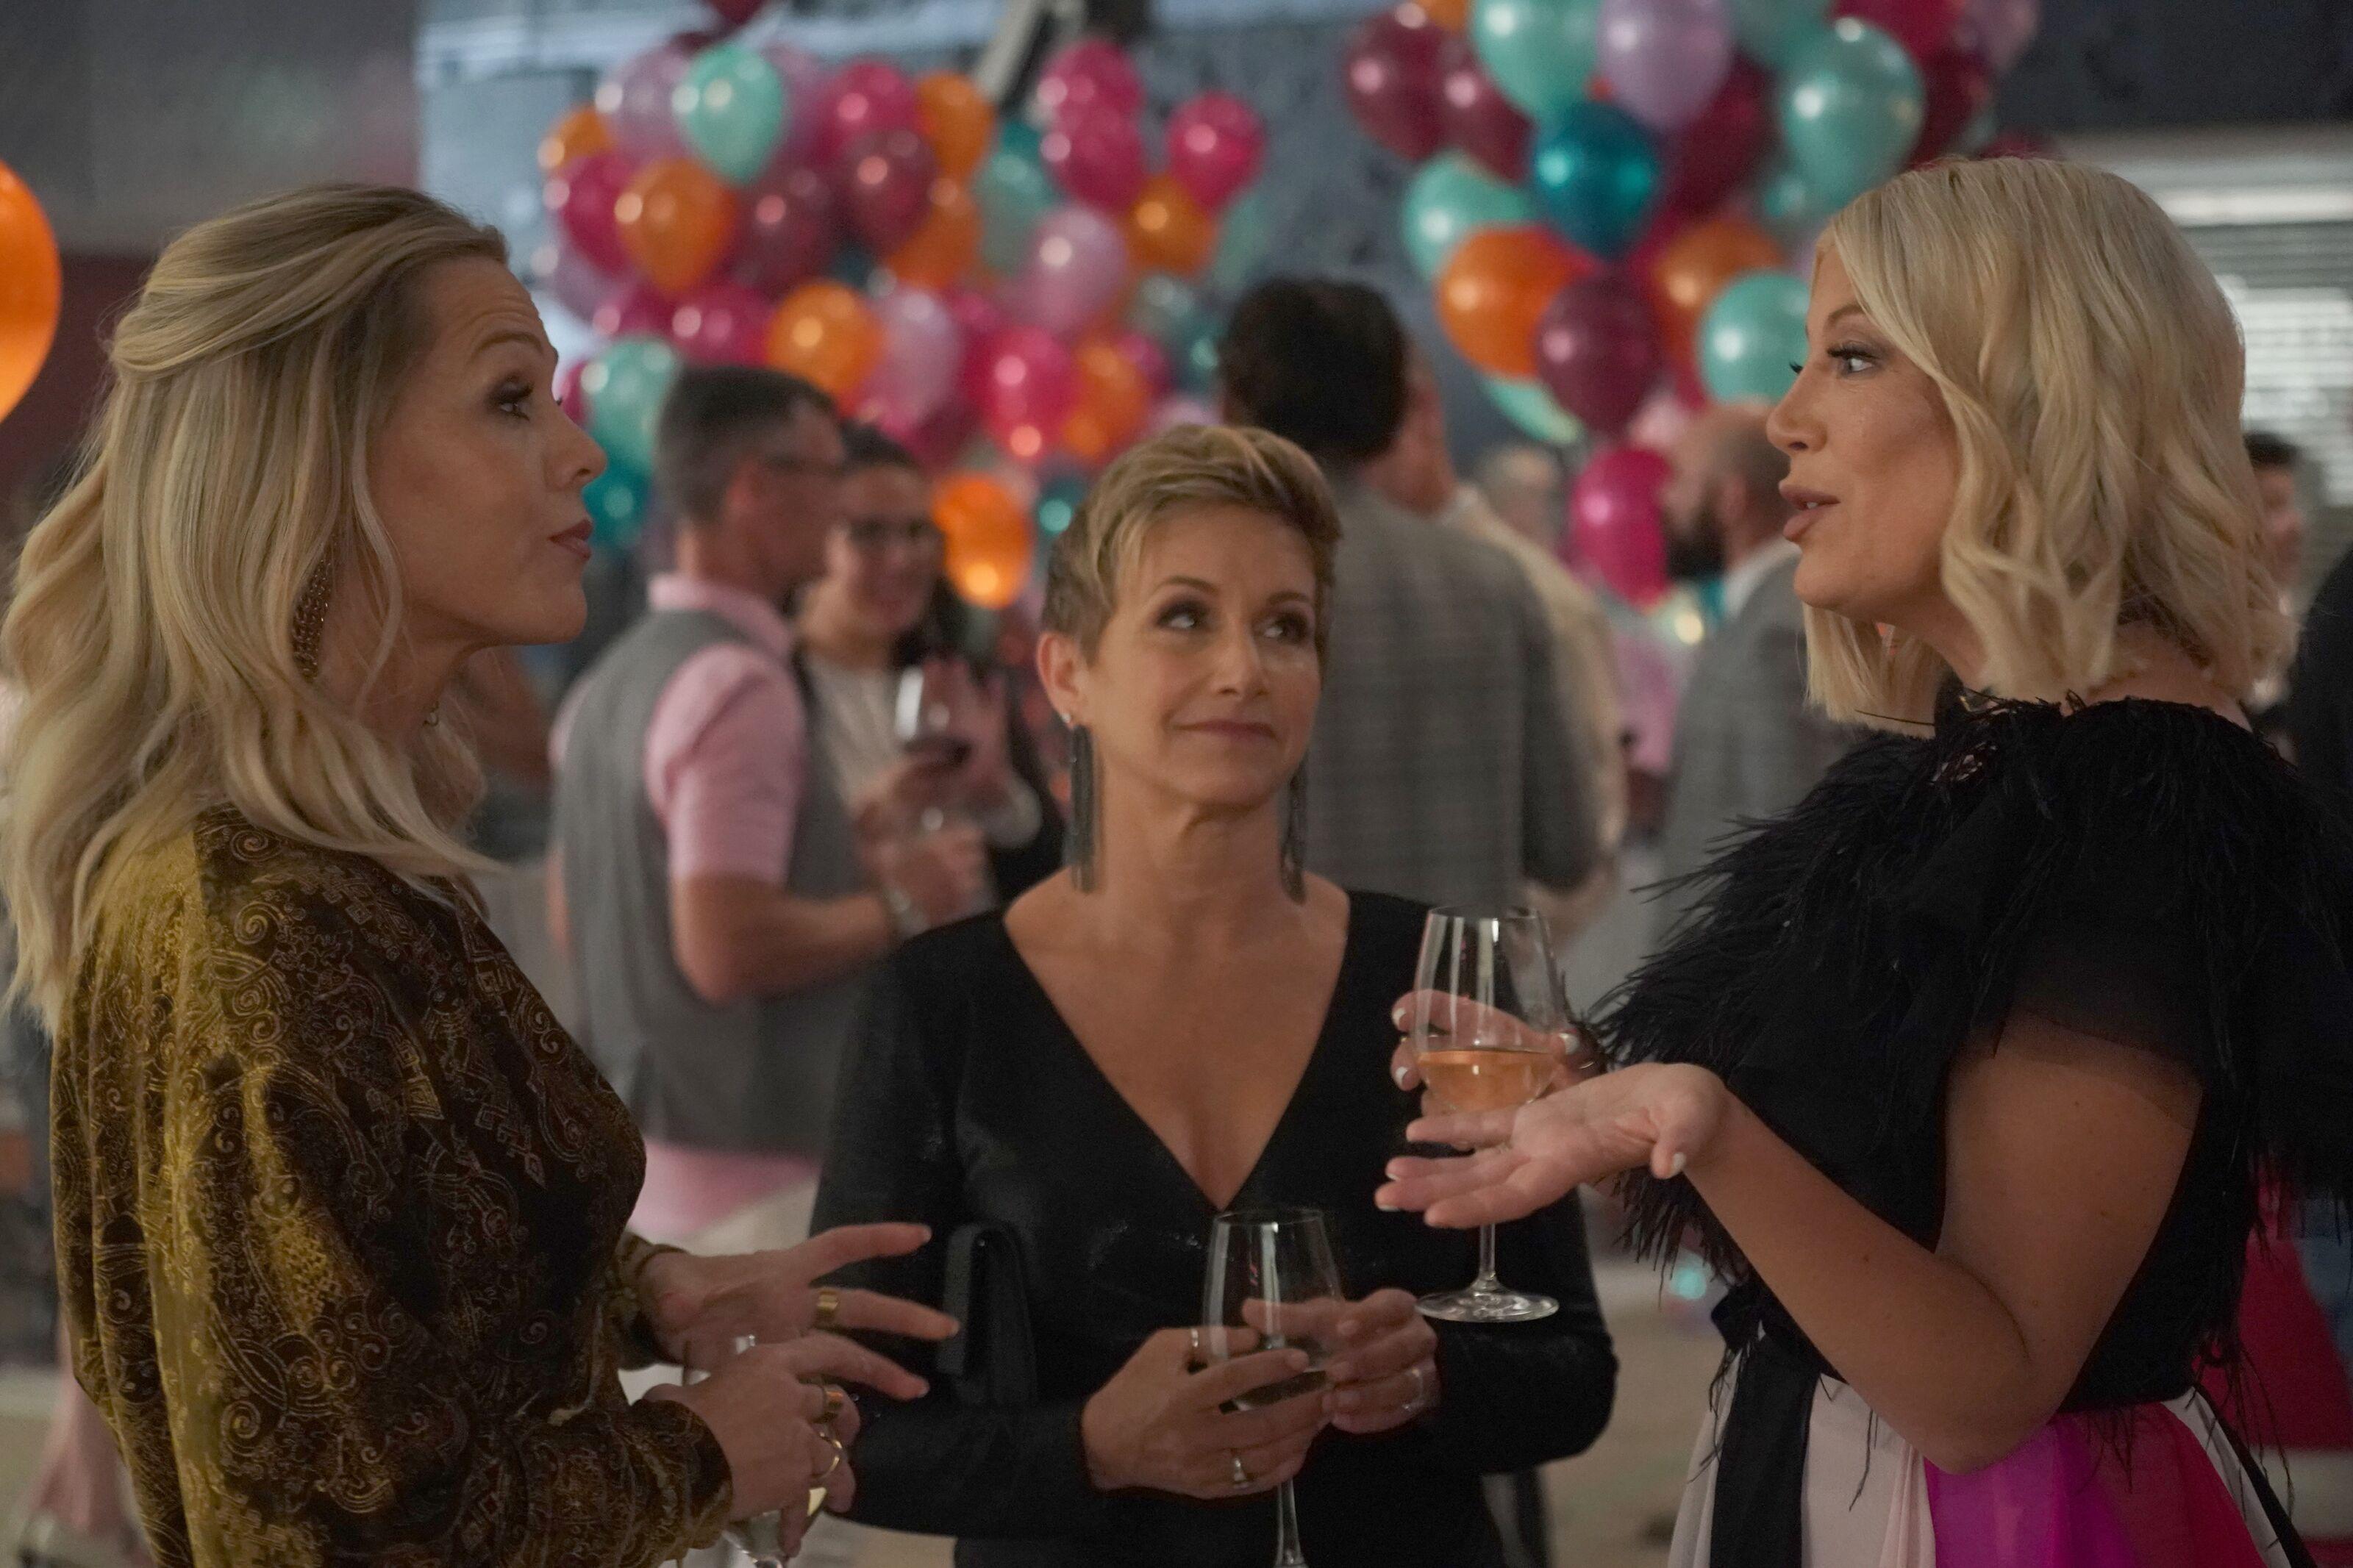 Will BH90210 be renewed for Season 2 on FOX?